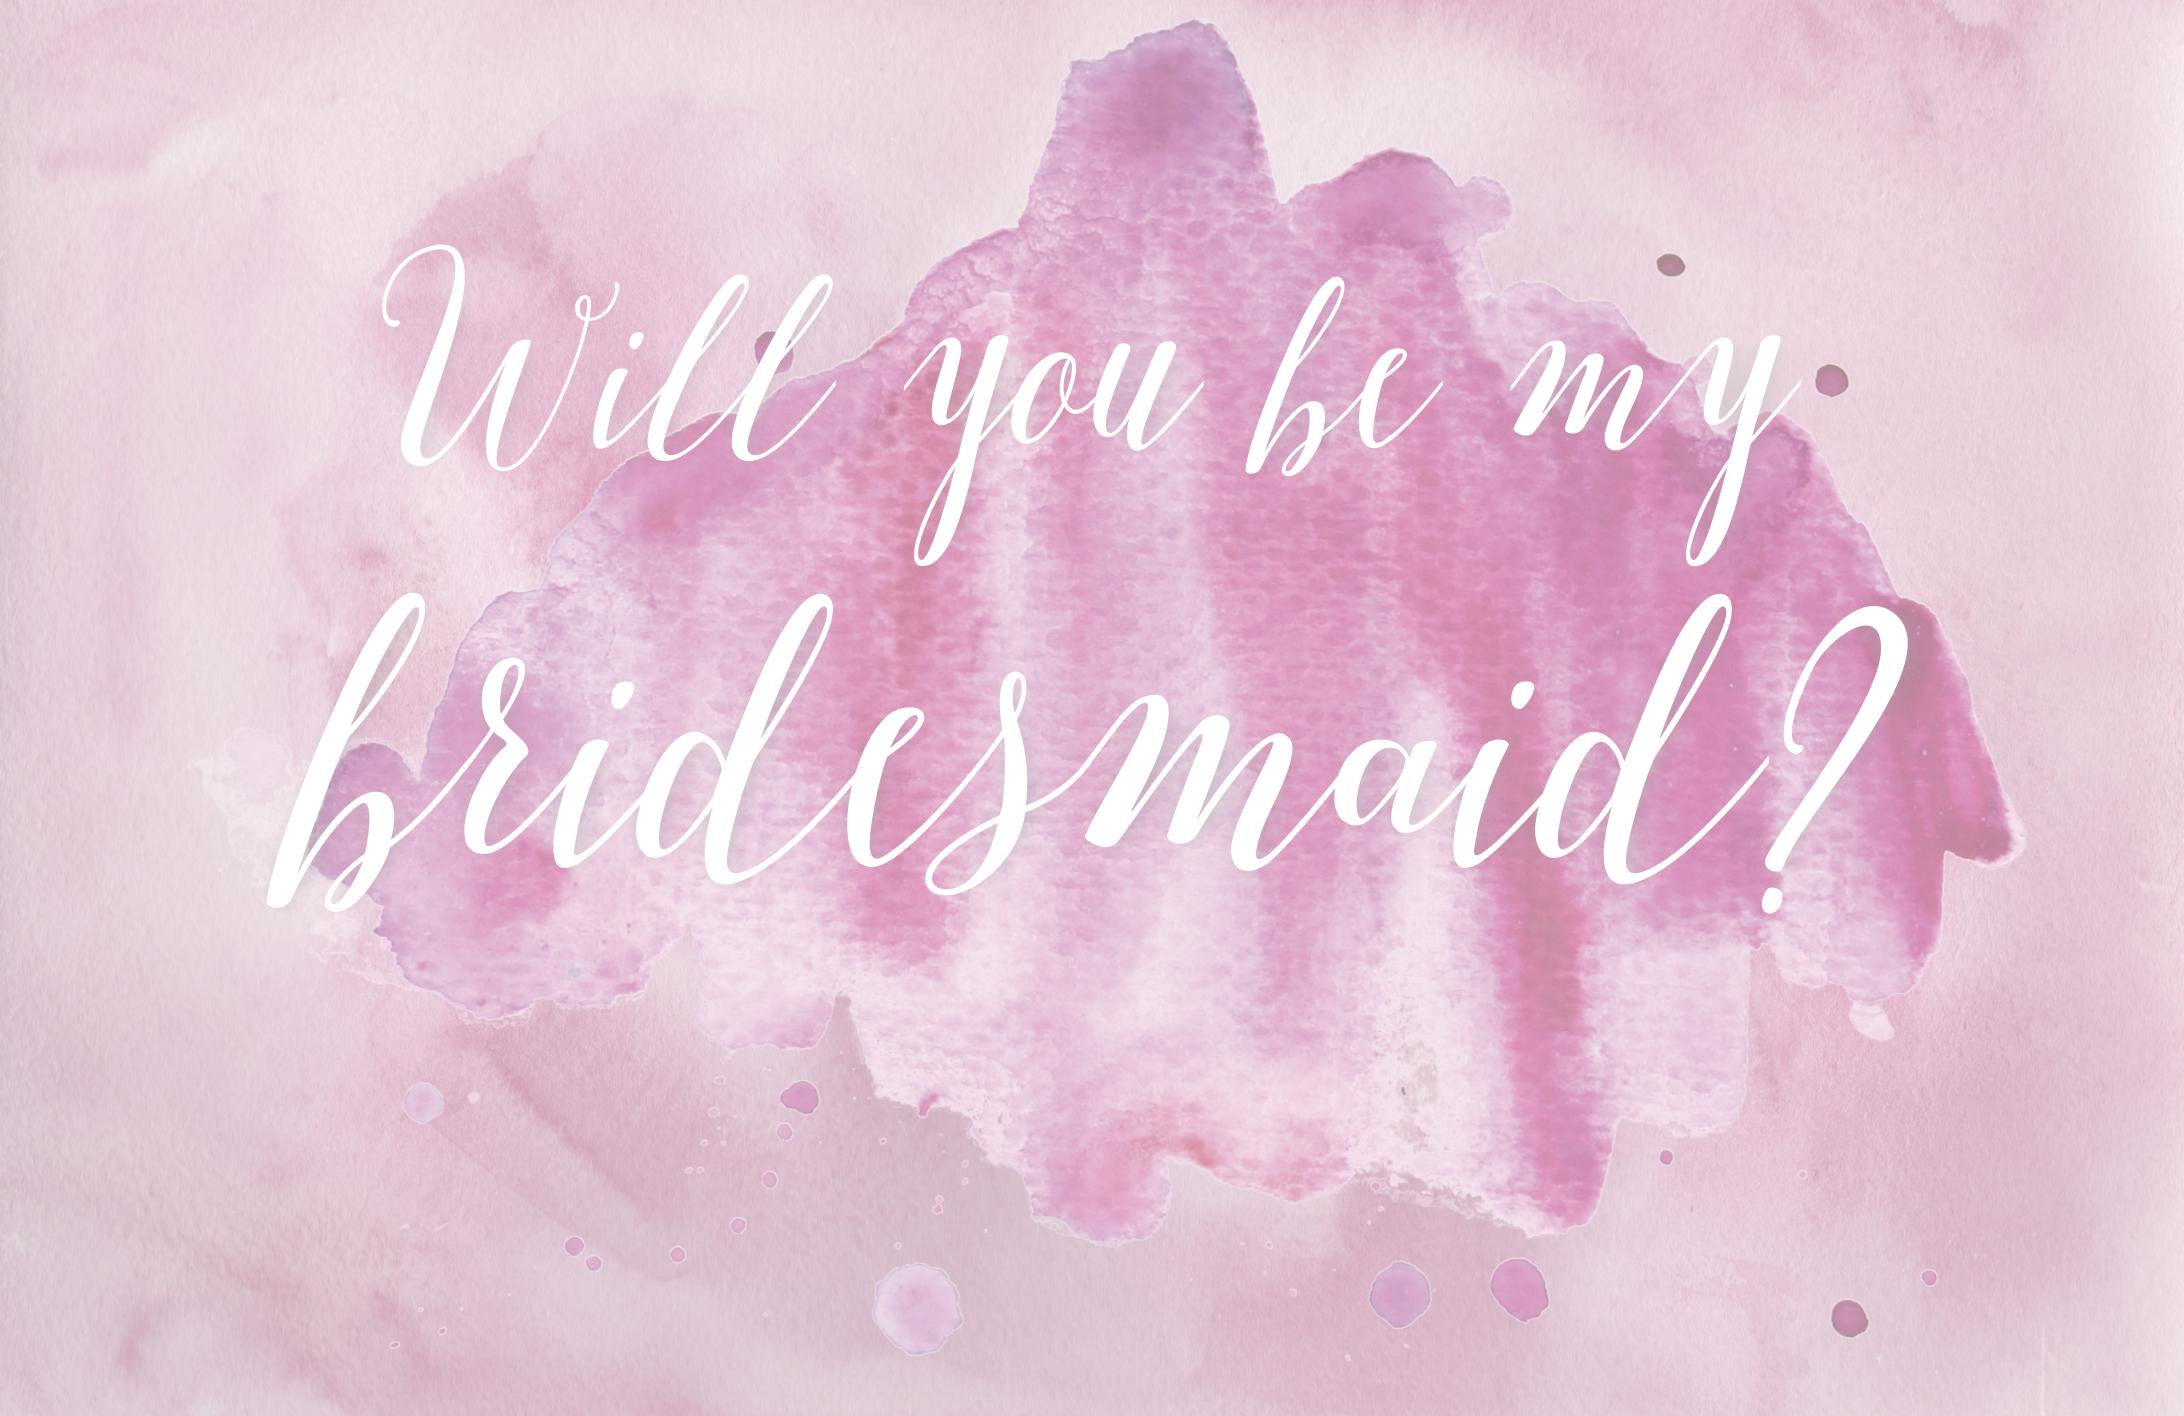 bridesmaid2.jpg